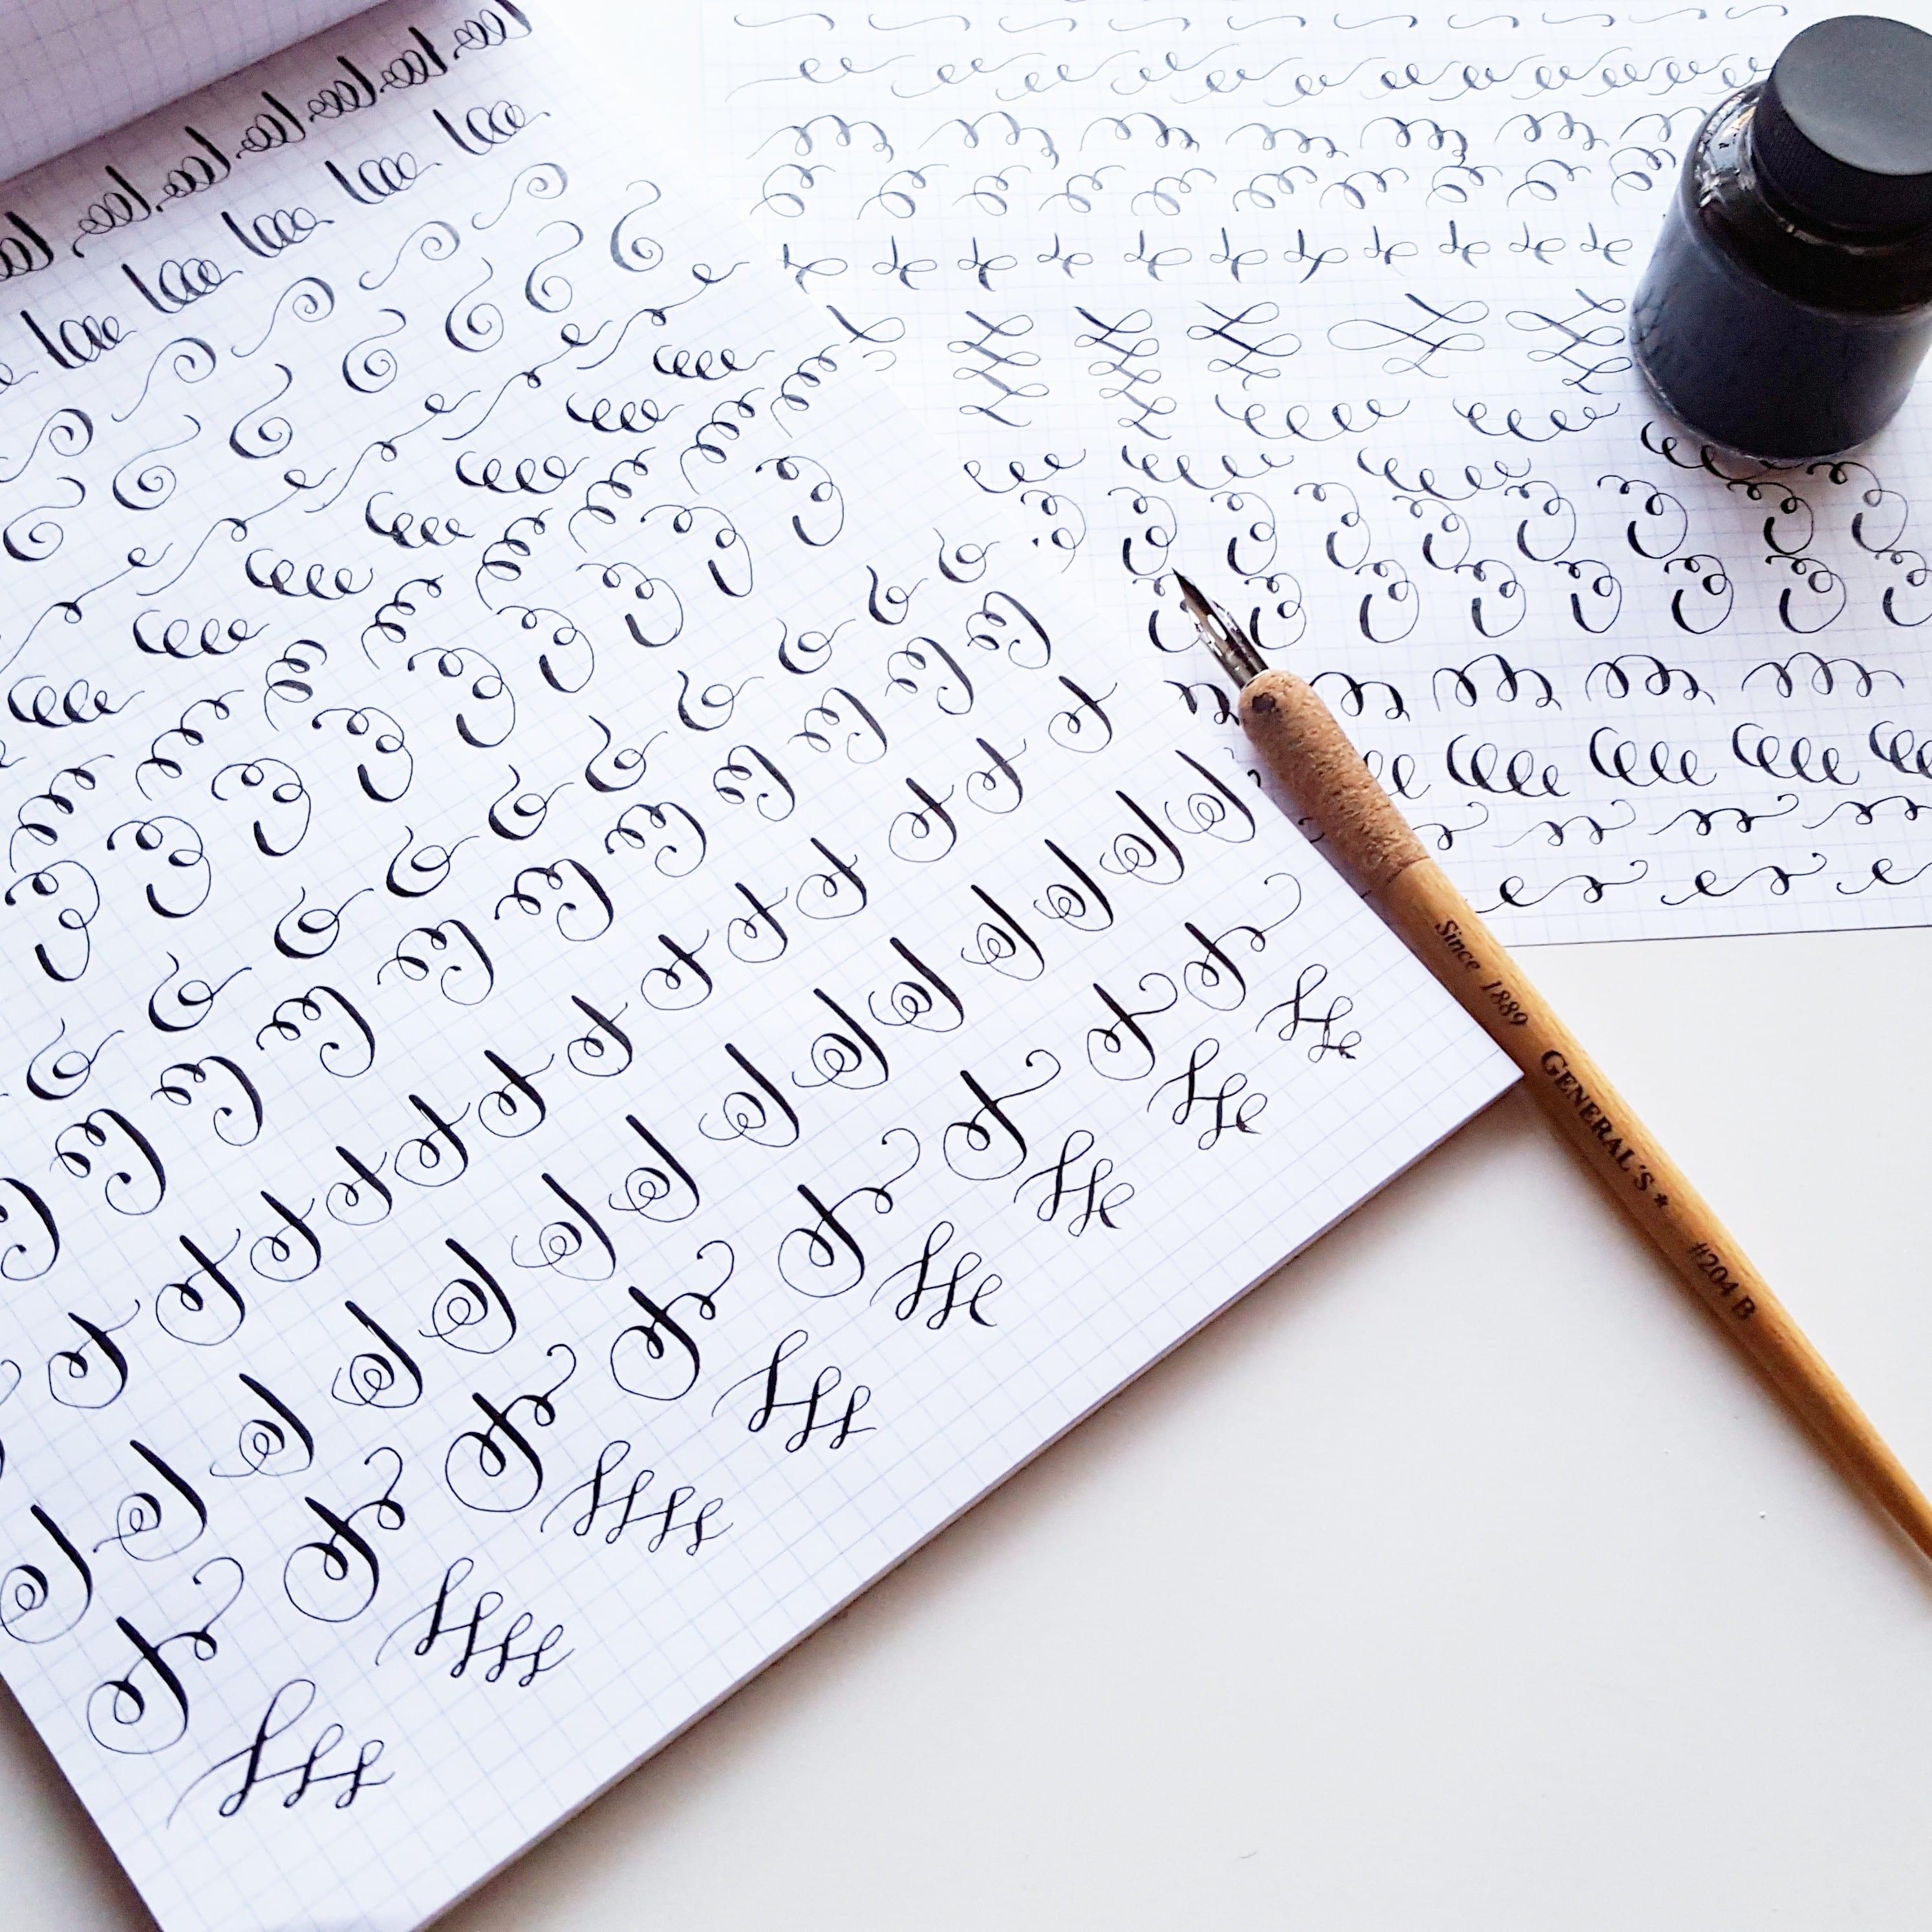 Drills help me feel more familiar with calligraphy flourishes, swirls, and loop // www.prettyprintsandpaper.com